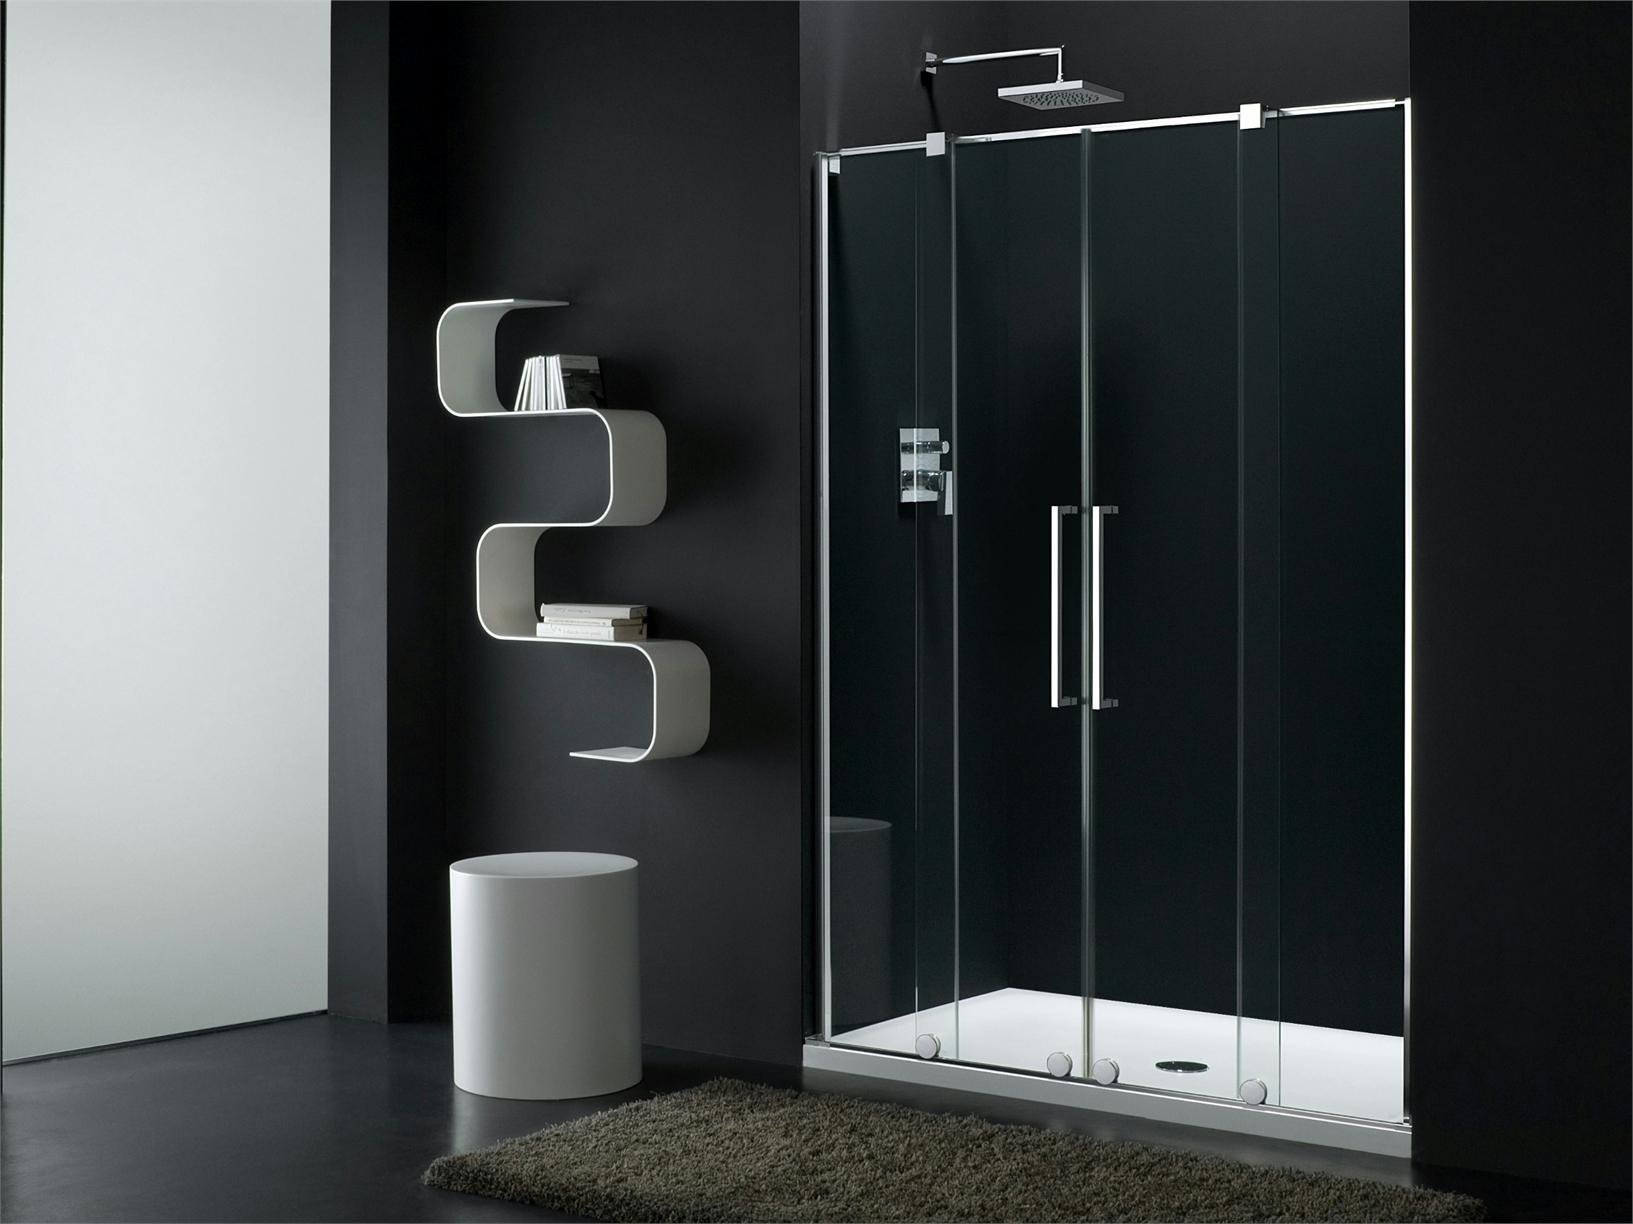 Provex box doccia vangeli giuseppe arredo bagno a for Arredo bagno costi